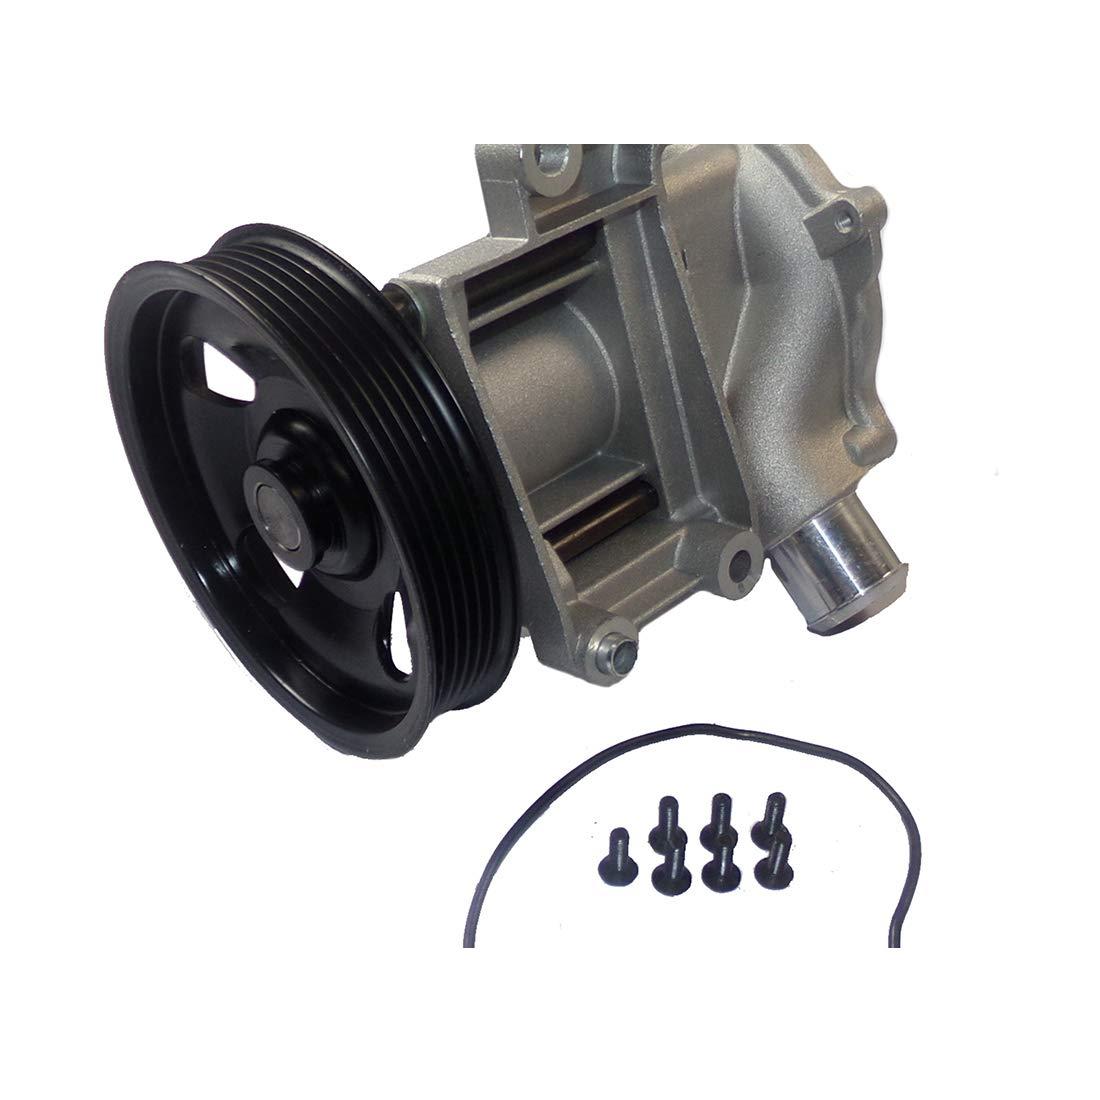 DNJ WP825 Water Pump for 2002-2008 / Mini/Cooper / 1.6L / SOHC / L4 / 16V / 1600cc / W10B16A